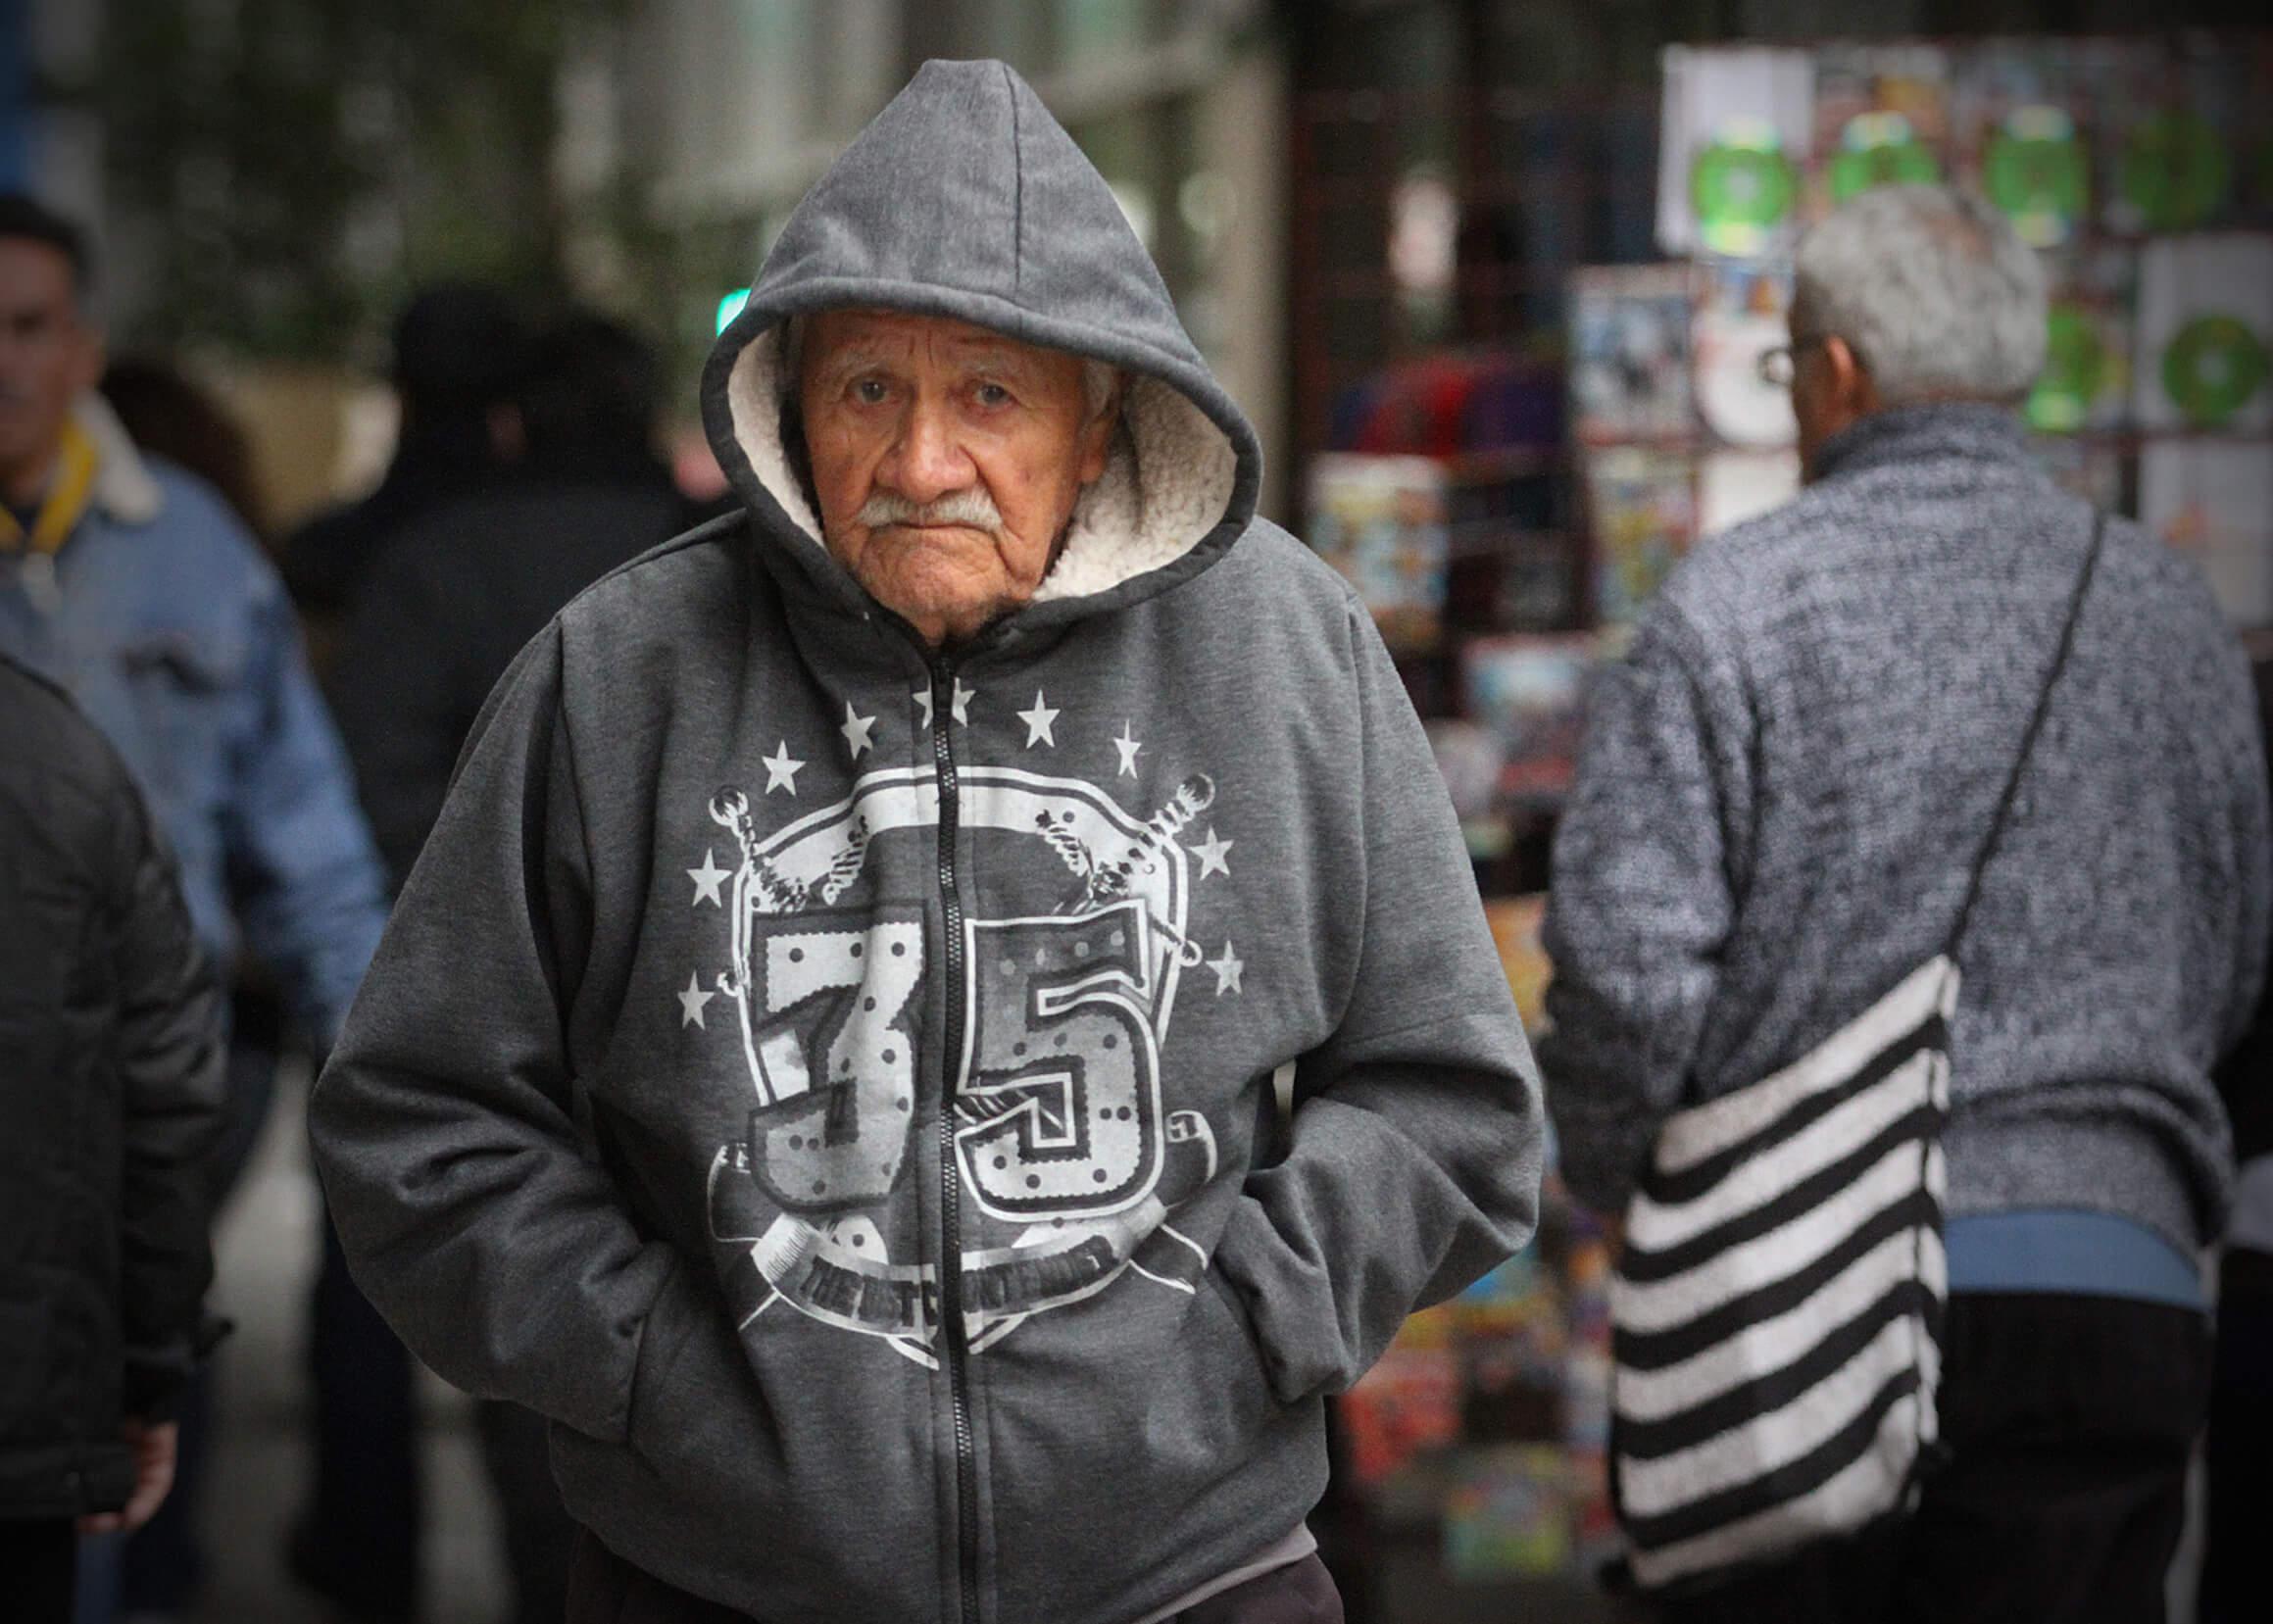 Clima Coahuila; temperaturas bajo cero para próximas horas